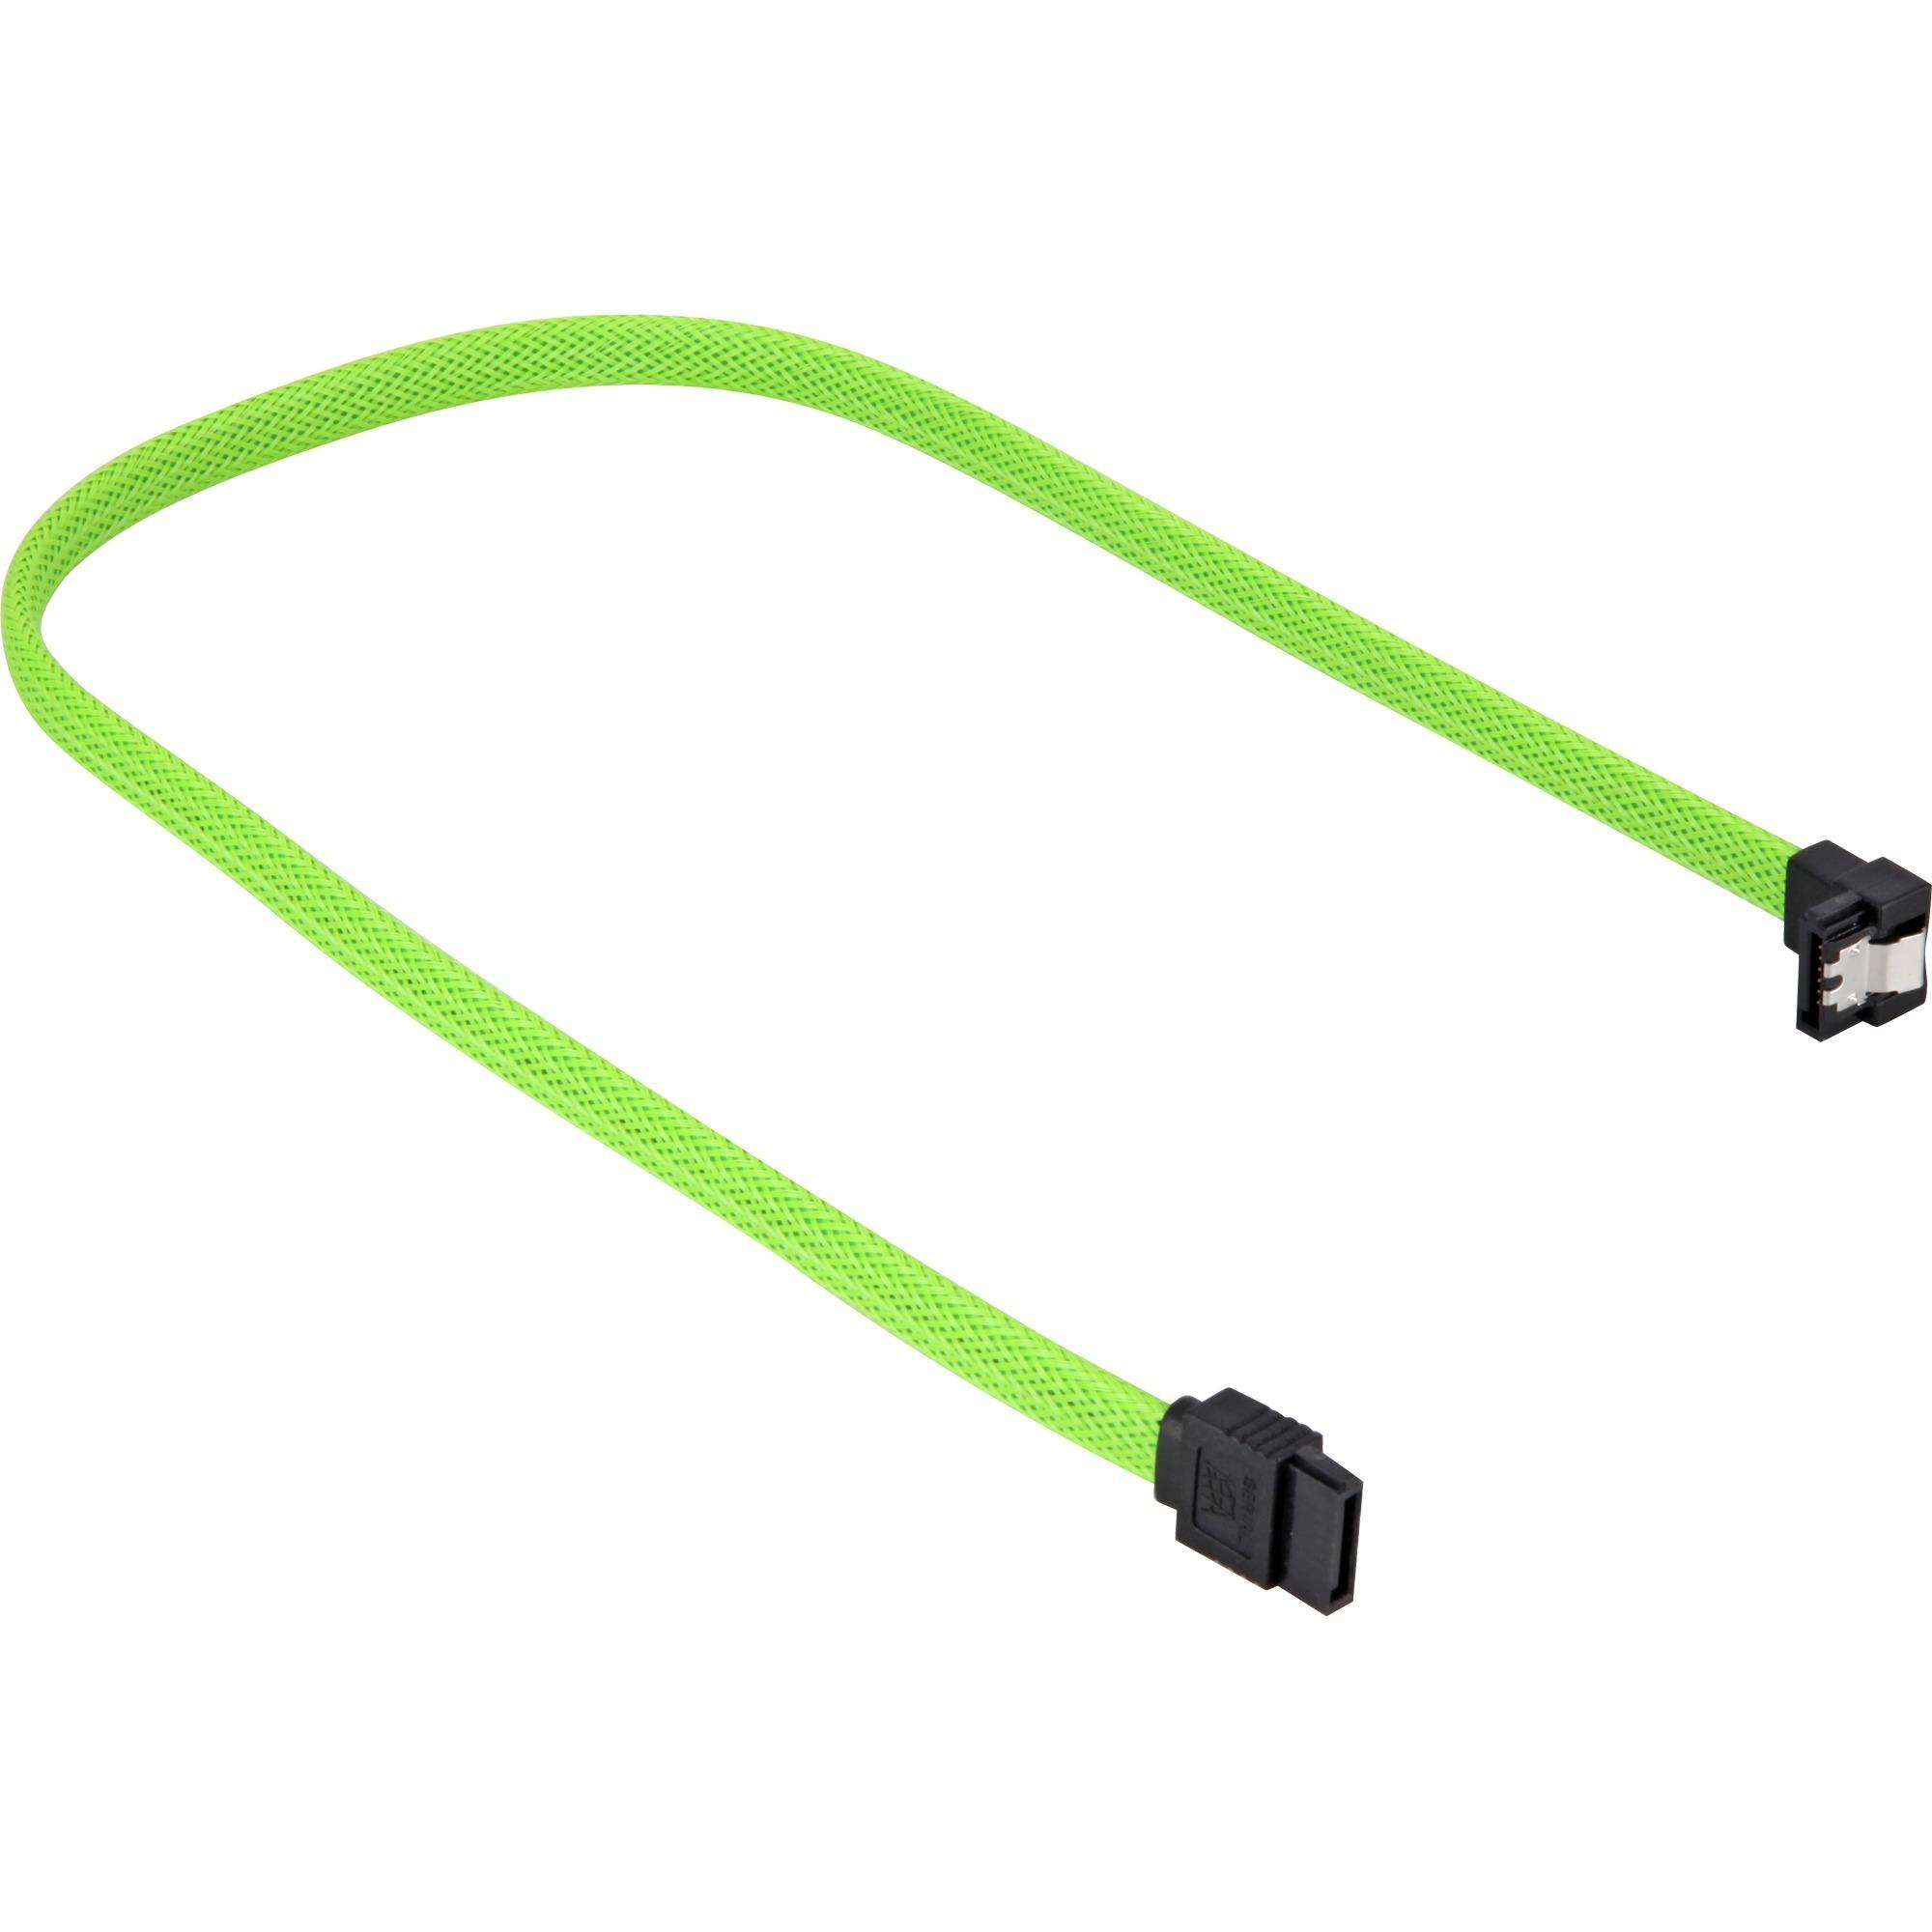 sata-3-045m-sata-iii-7-pin-sata-iii-7-pin-sort-gron-sata-kabel